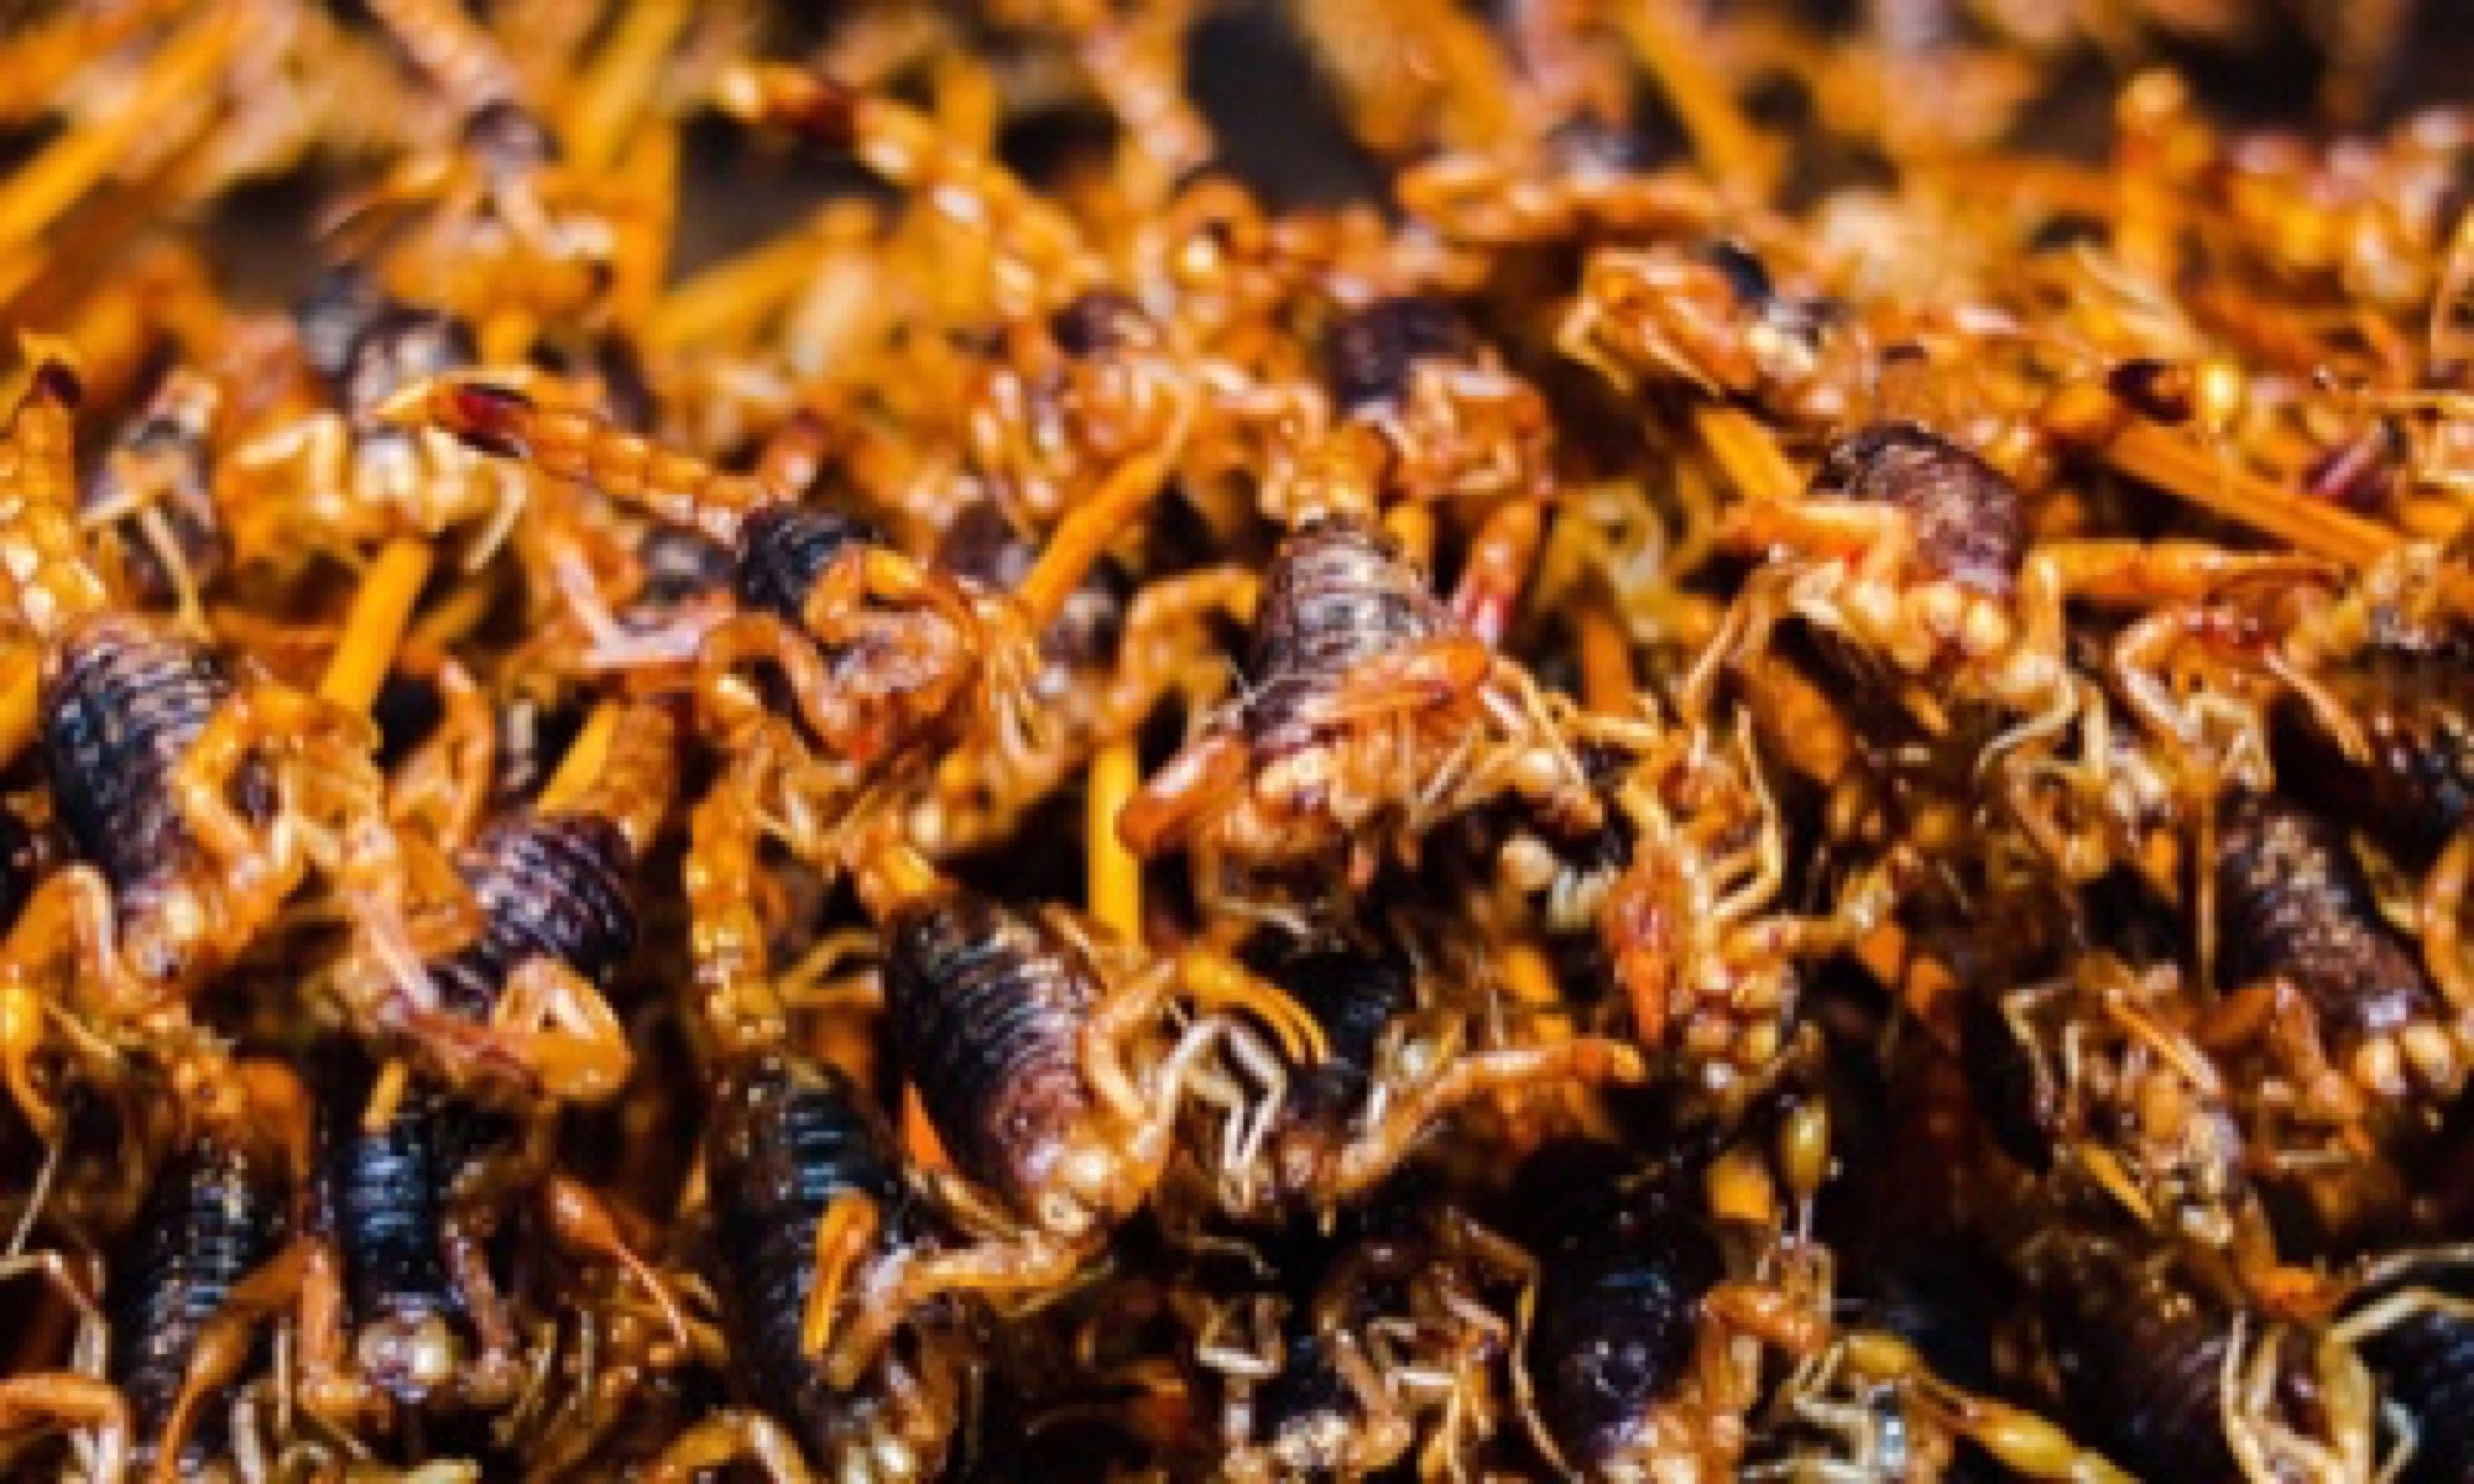 Deep fried scorpions (Matthew Woodward)